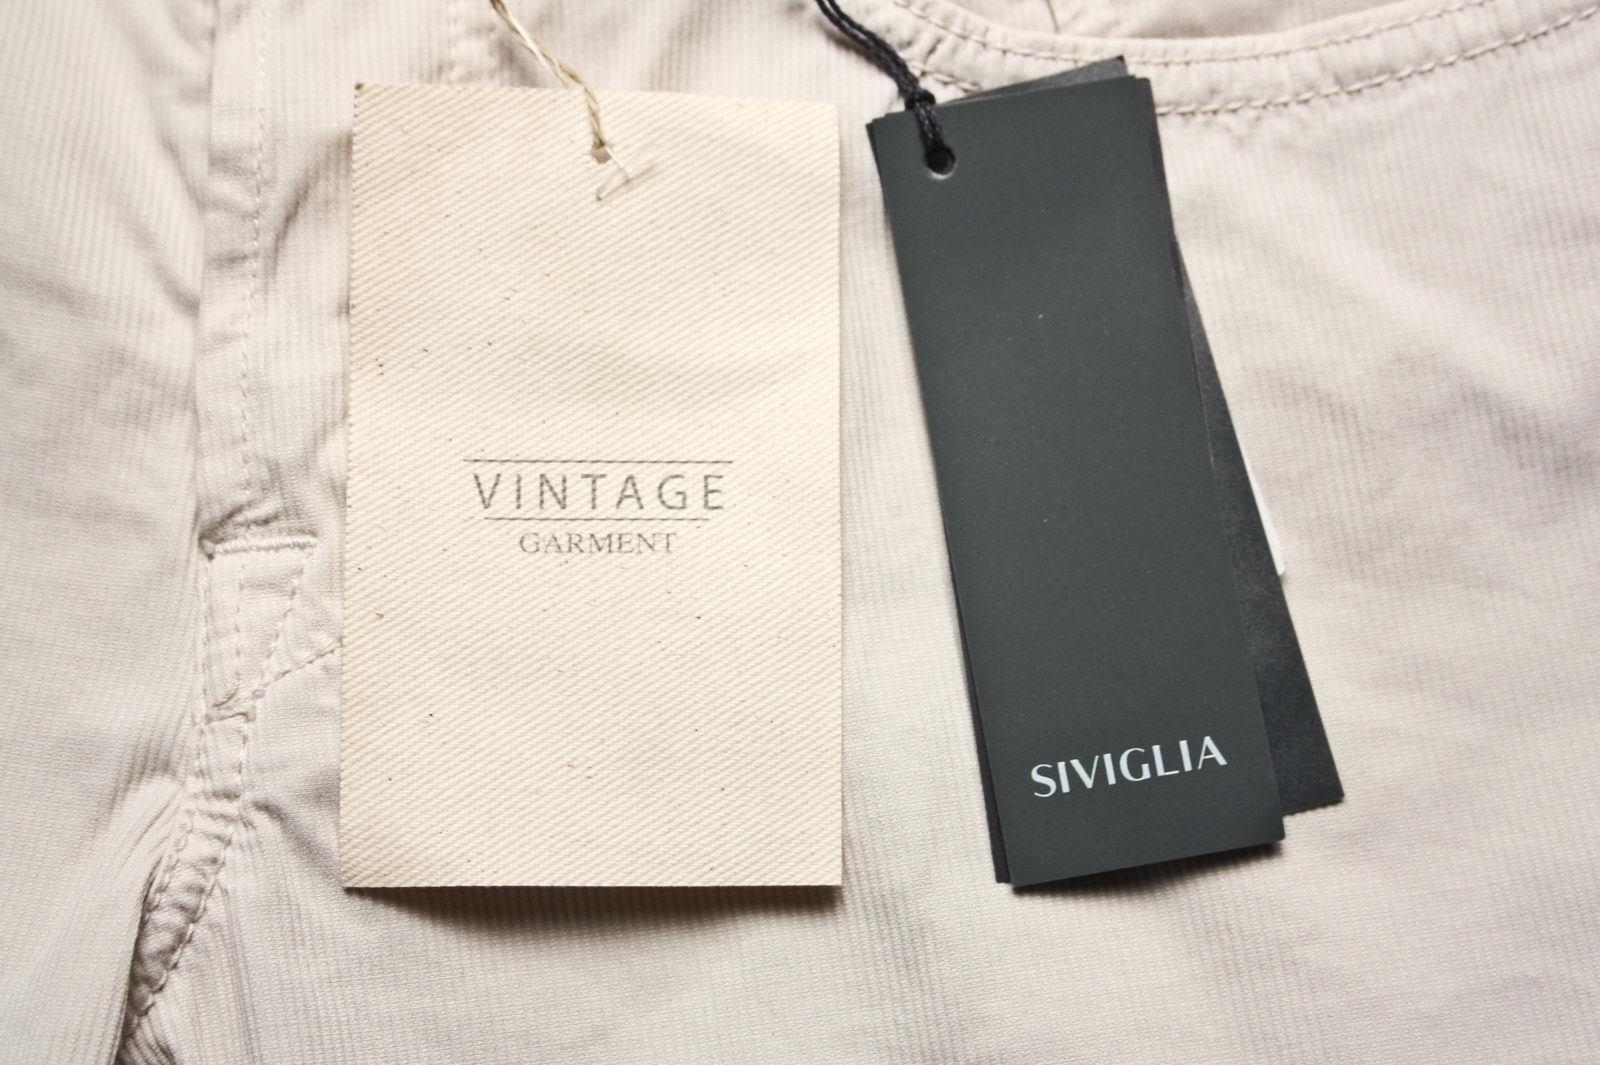 Pantaloni Siviglia Jeans Jeans Jeans Trouser Cotone Uomo Beige SP021U10045B018 S301 84a0e3